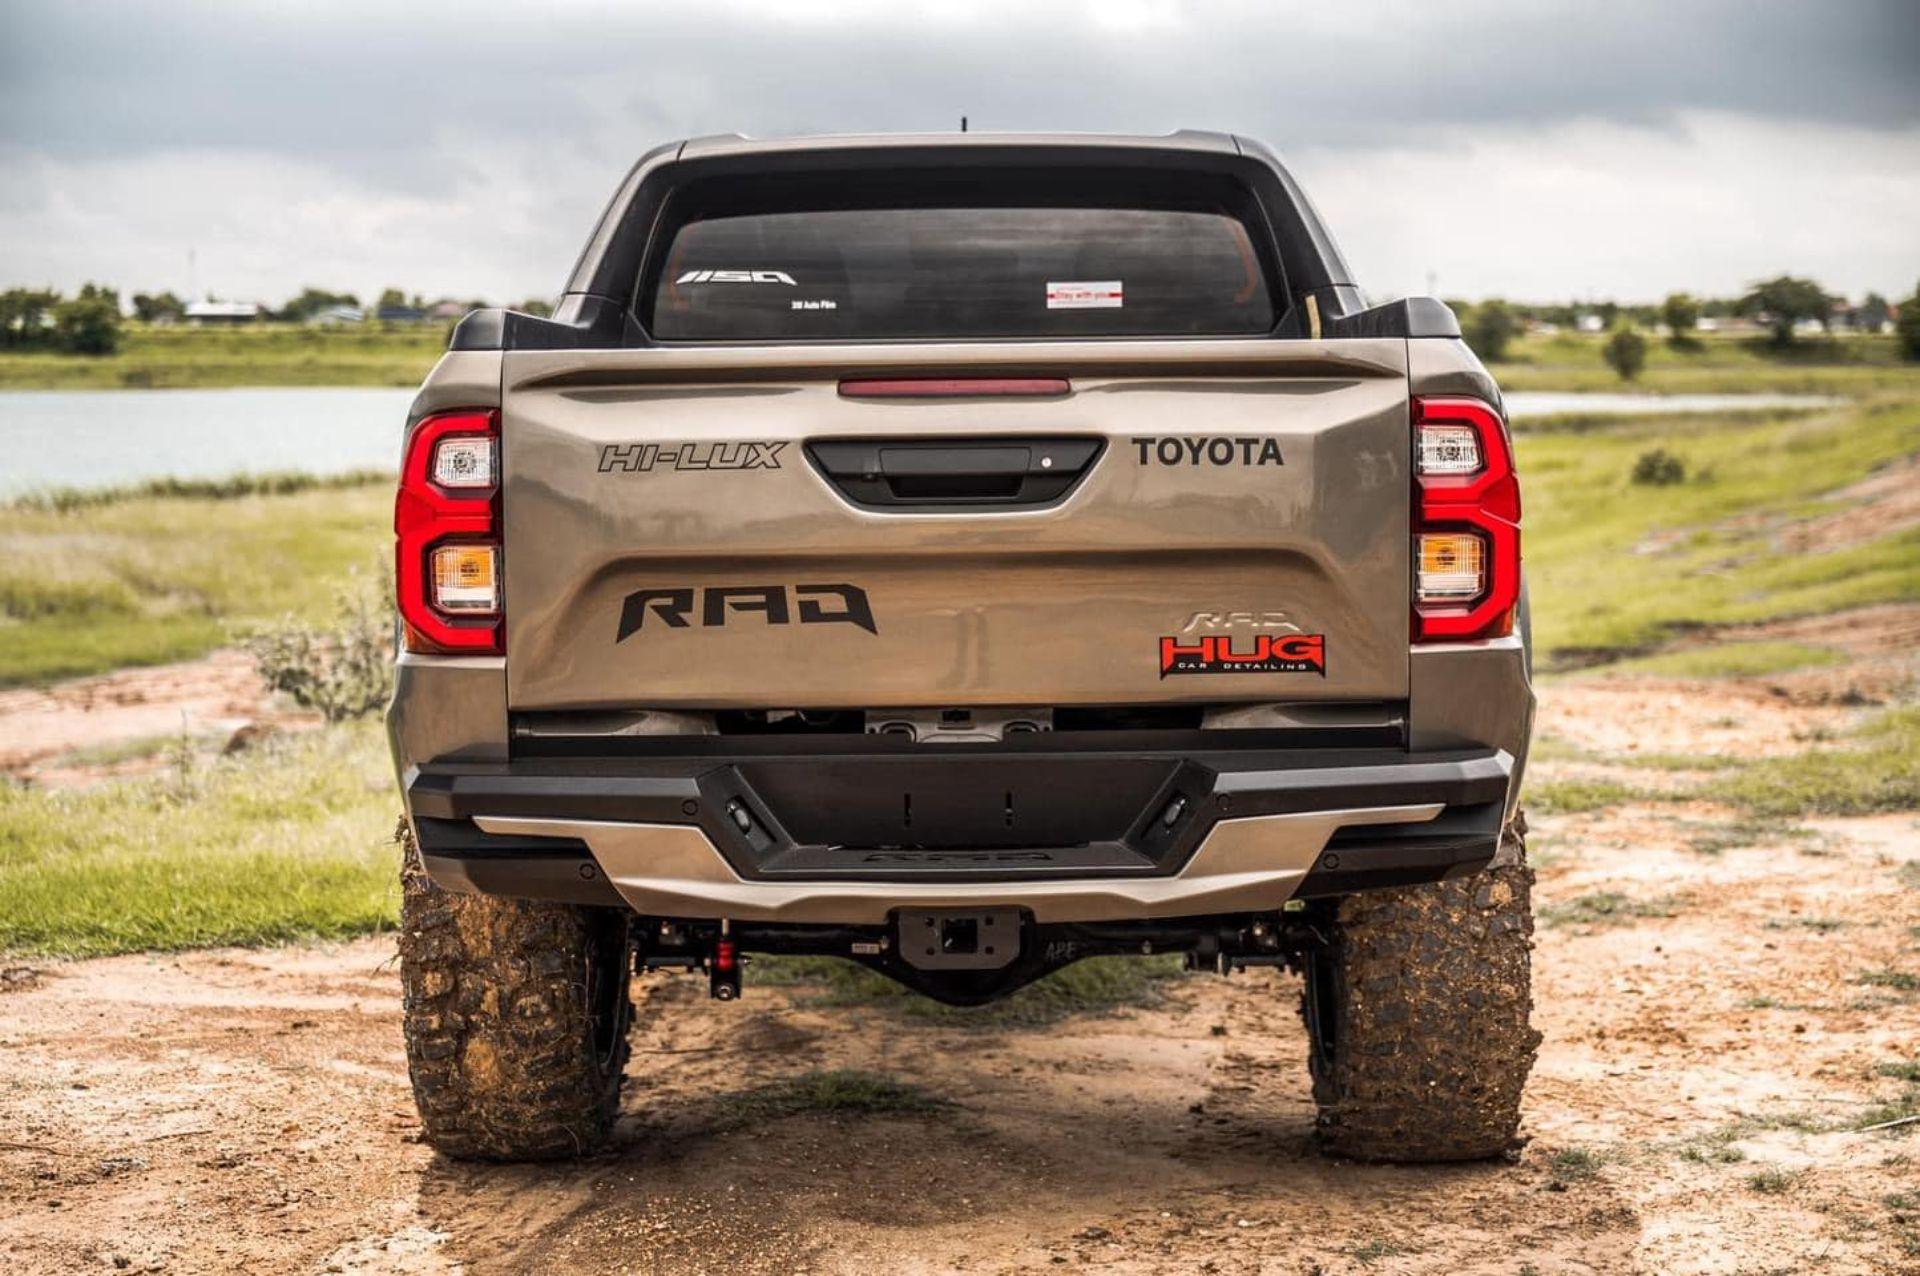 Toyota-Hilux-Pathfinder-by-RAD-10